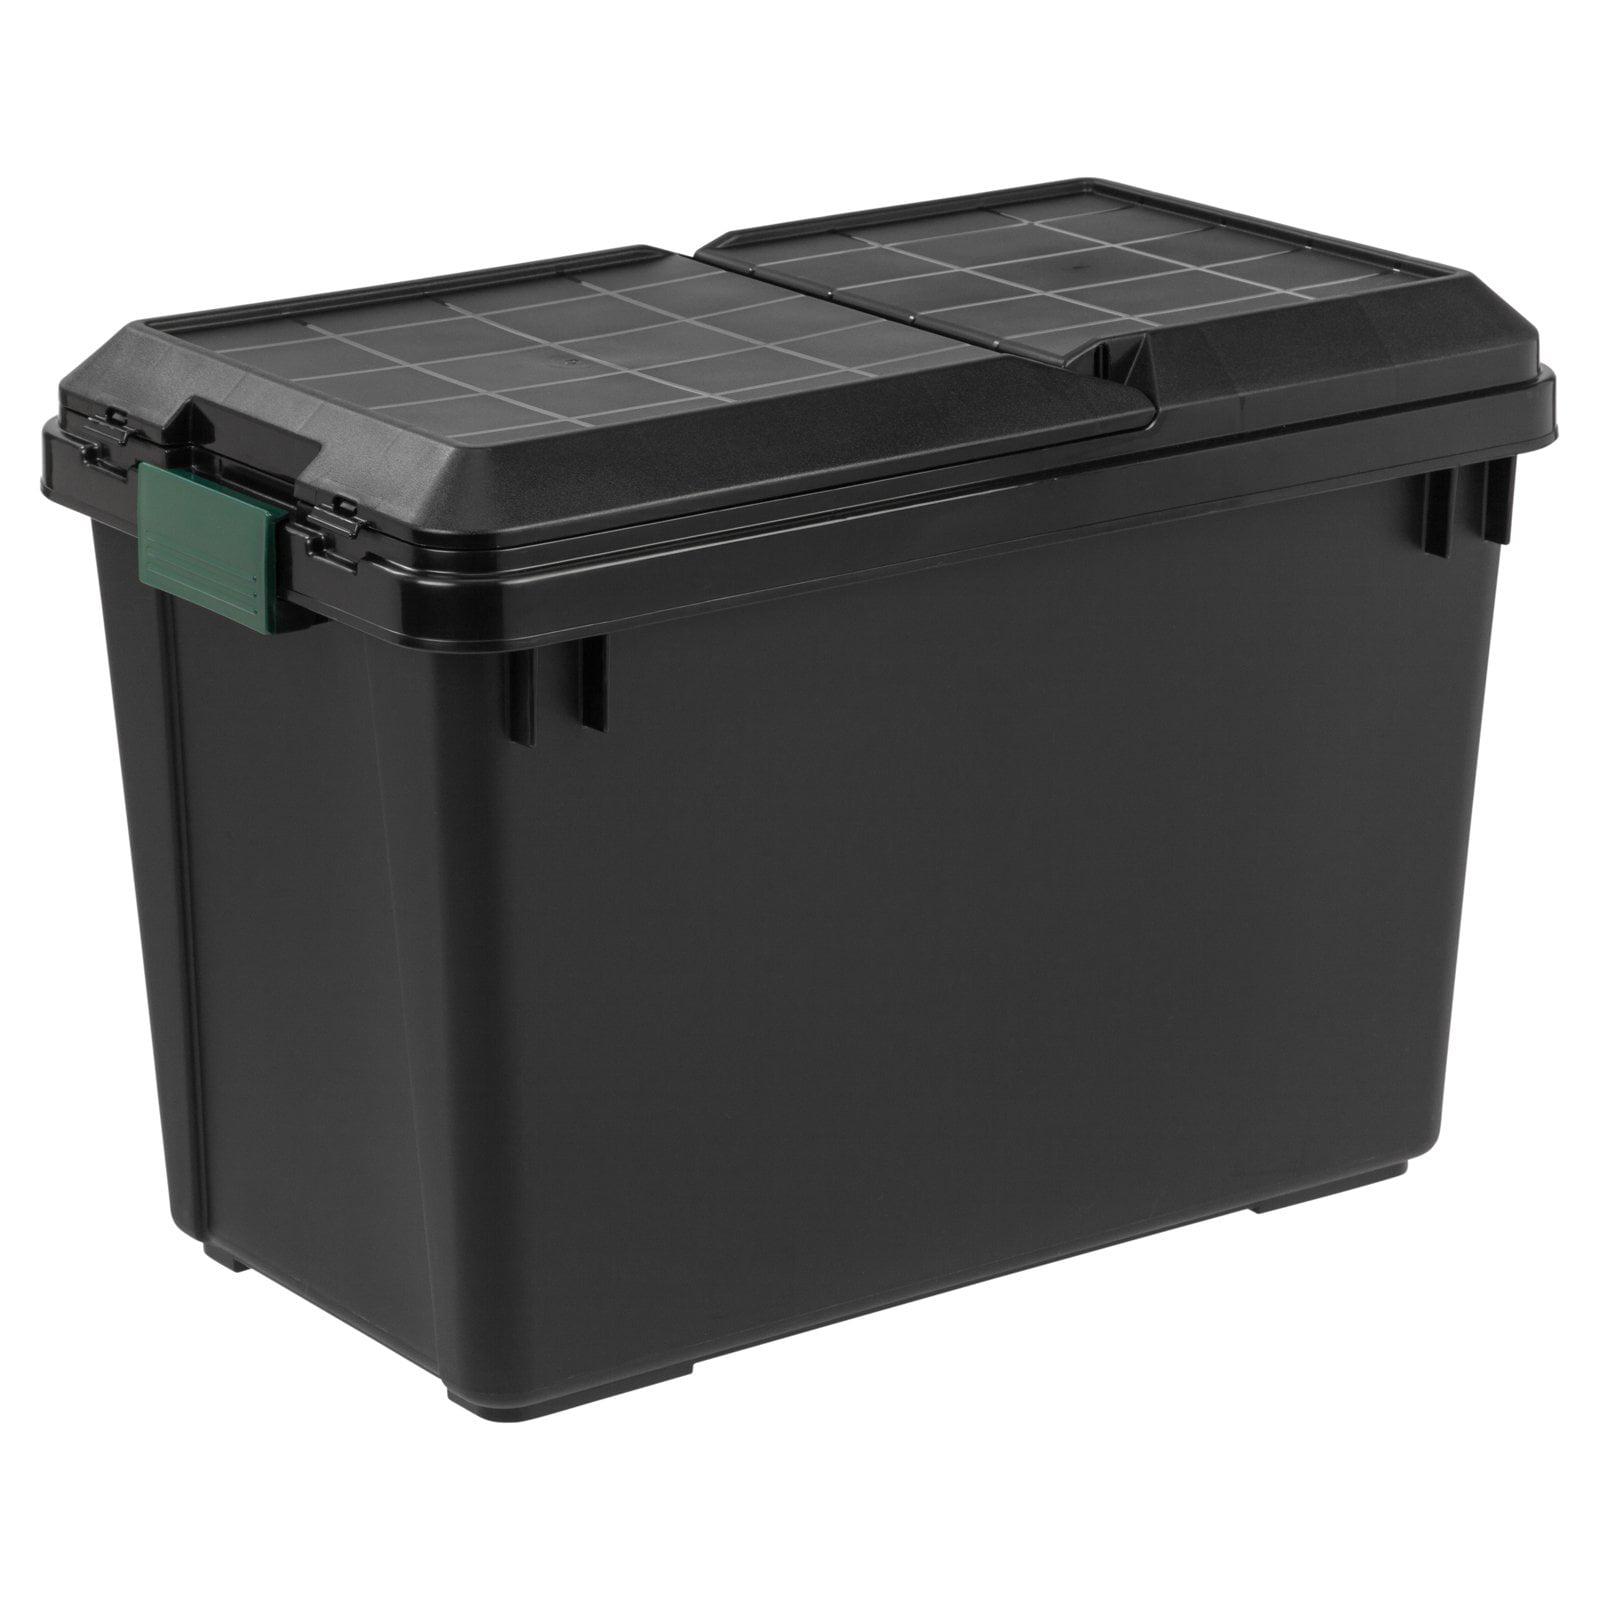 Iris Remington 102 Qt. Store-It-All Plastic Storage Tote with Compartment Lid, Black